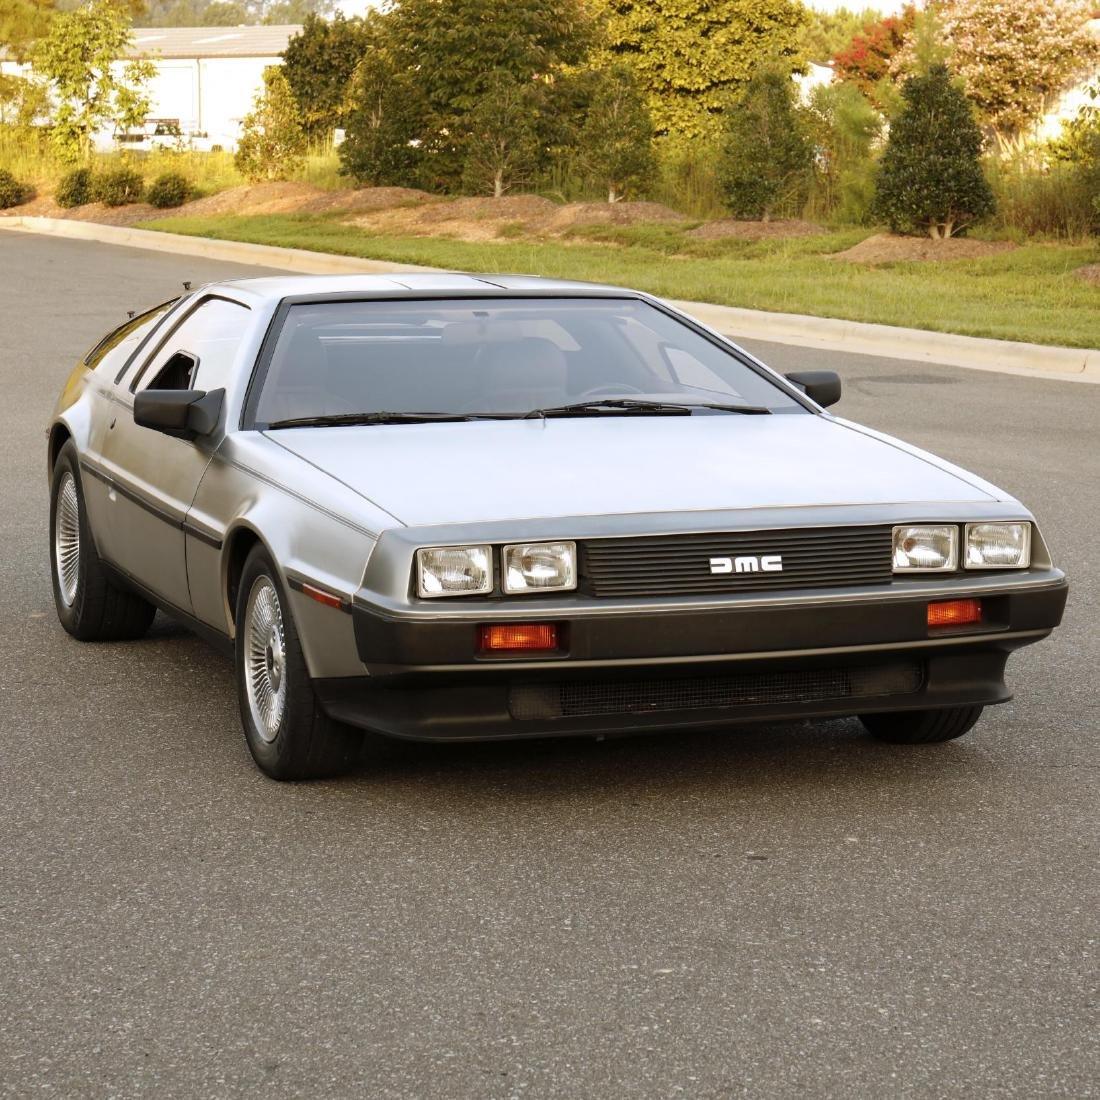 1981 DeLorean DMC-12 - 4